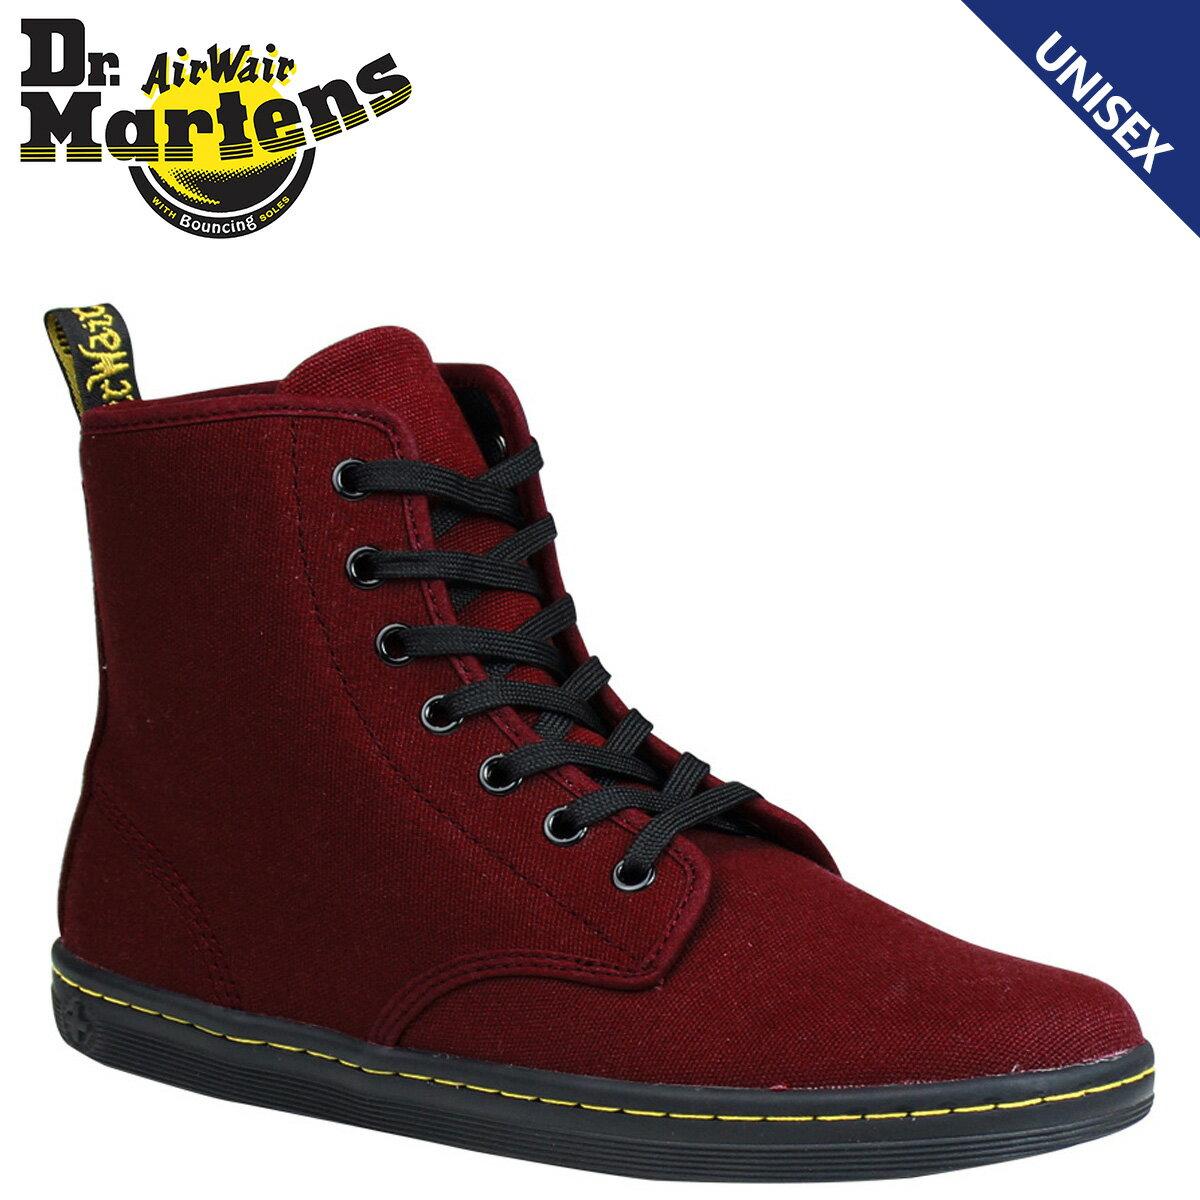 Dr.Martens ドクターマーチン 7ホール ブーツ SHOREDITCH R13524603 メンズ レディース [S10][返品不可]